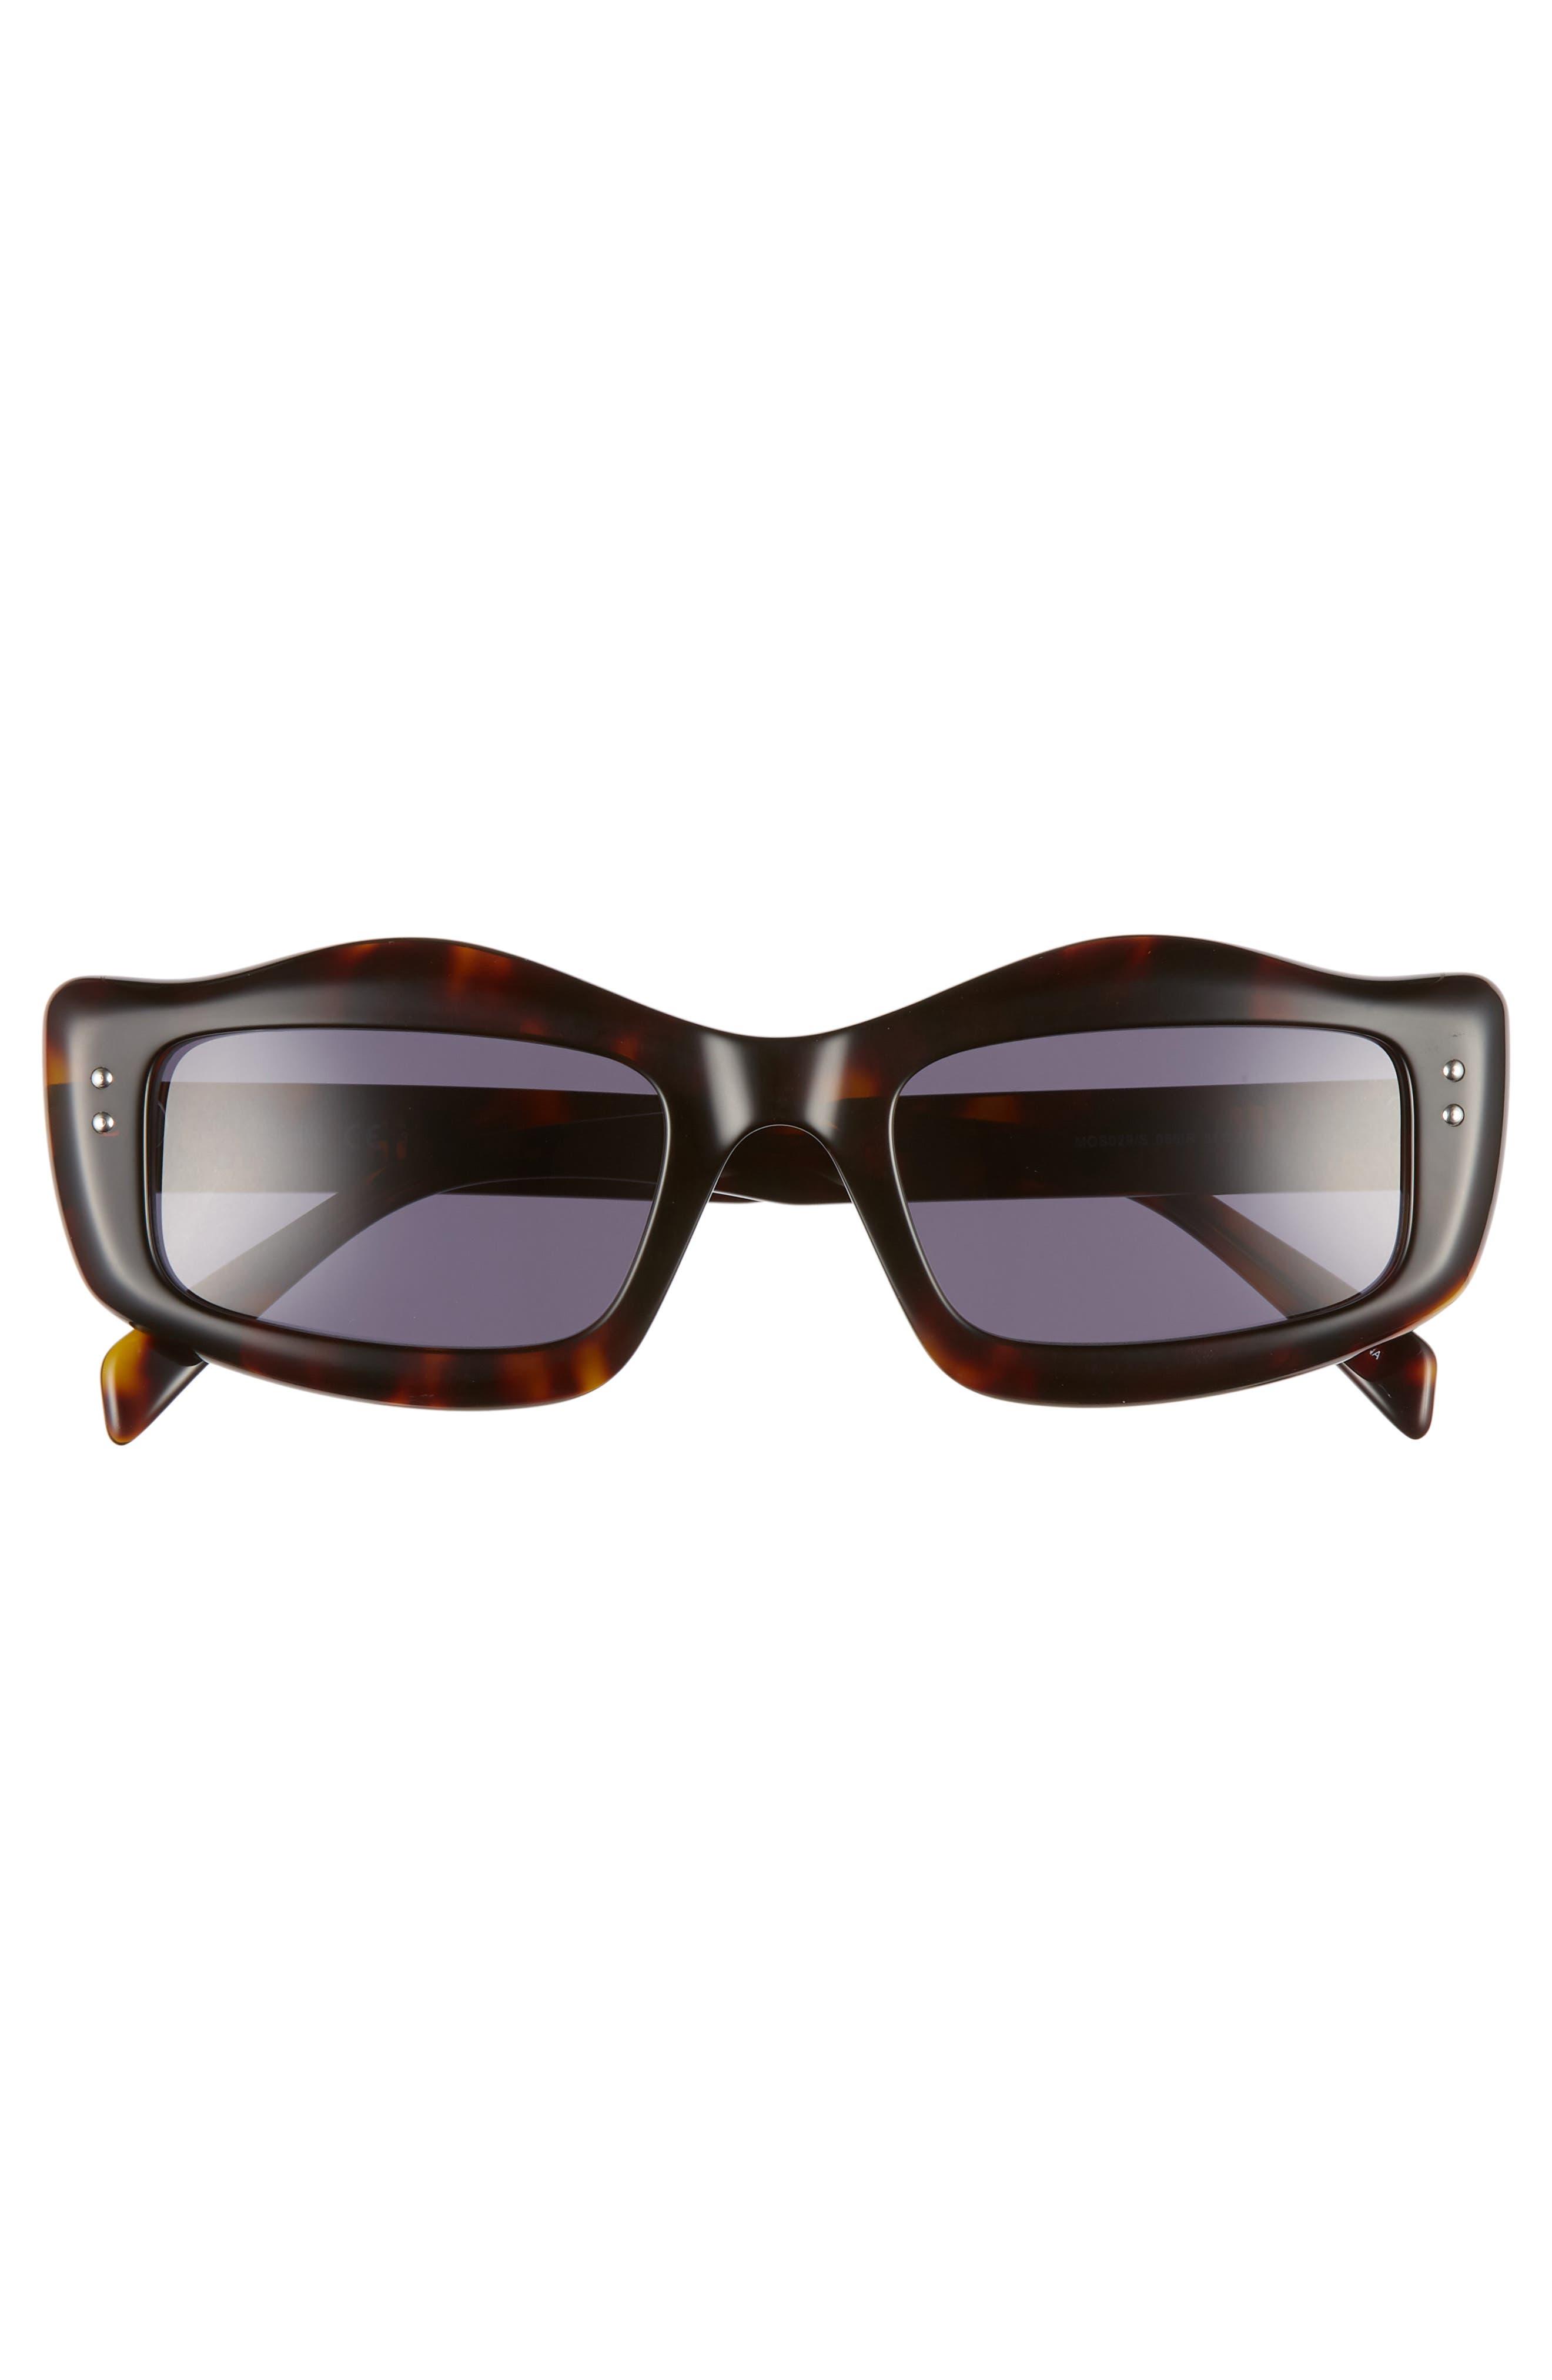 MOSCHINO, 51mm Rectangle Sunglasses, Alternate thumbnail 3, color, DARK HAVANA